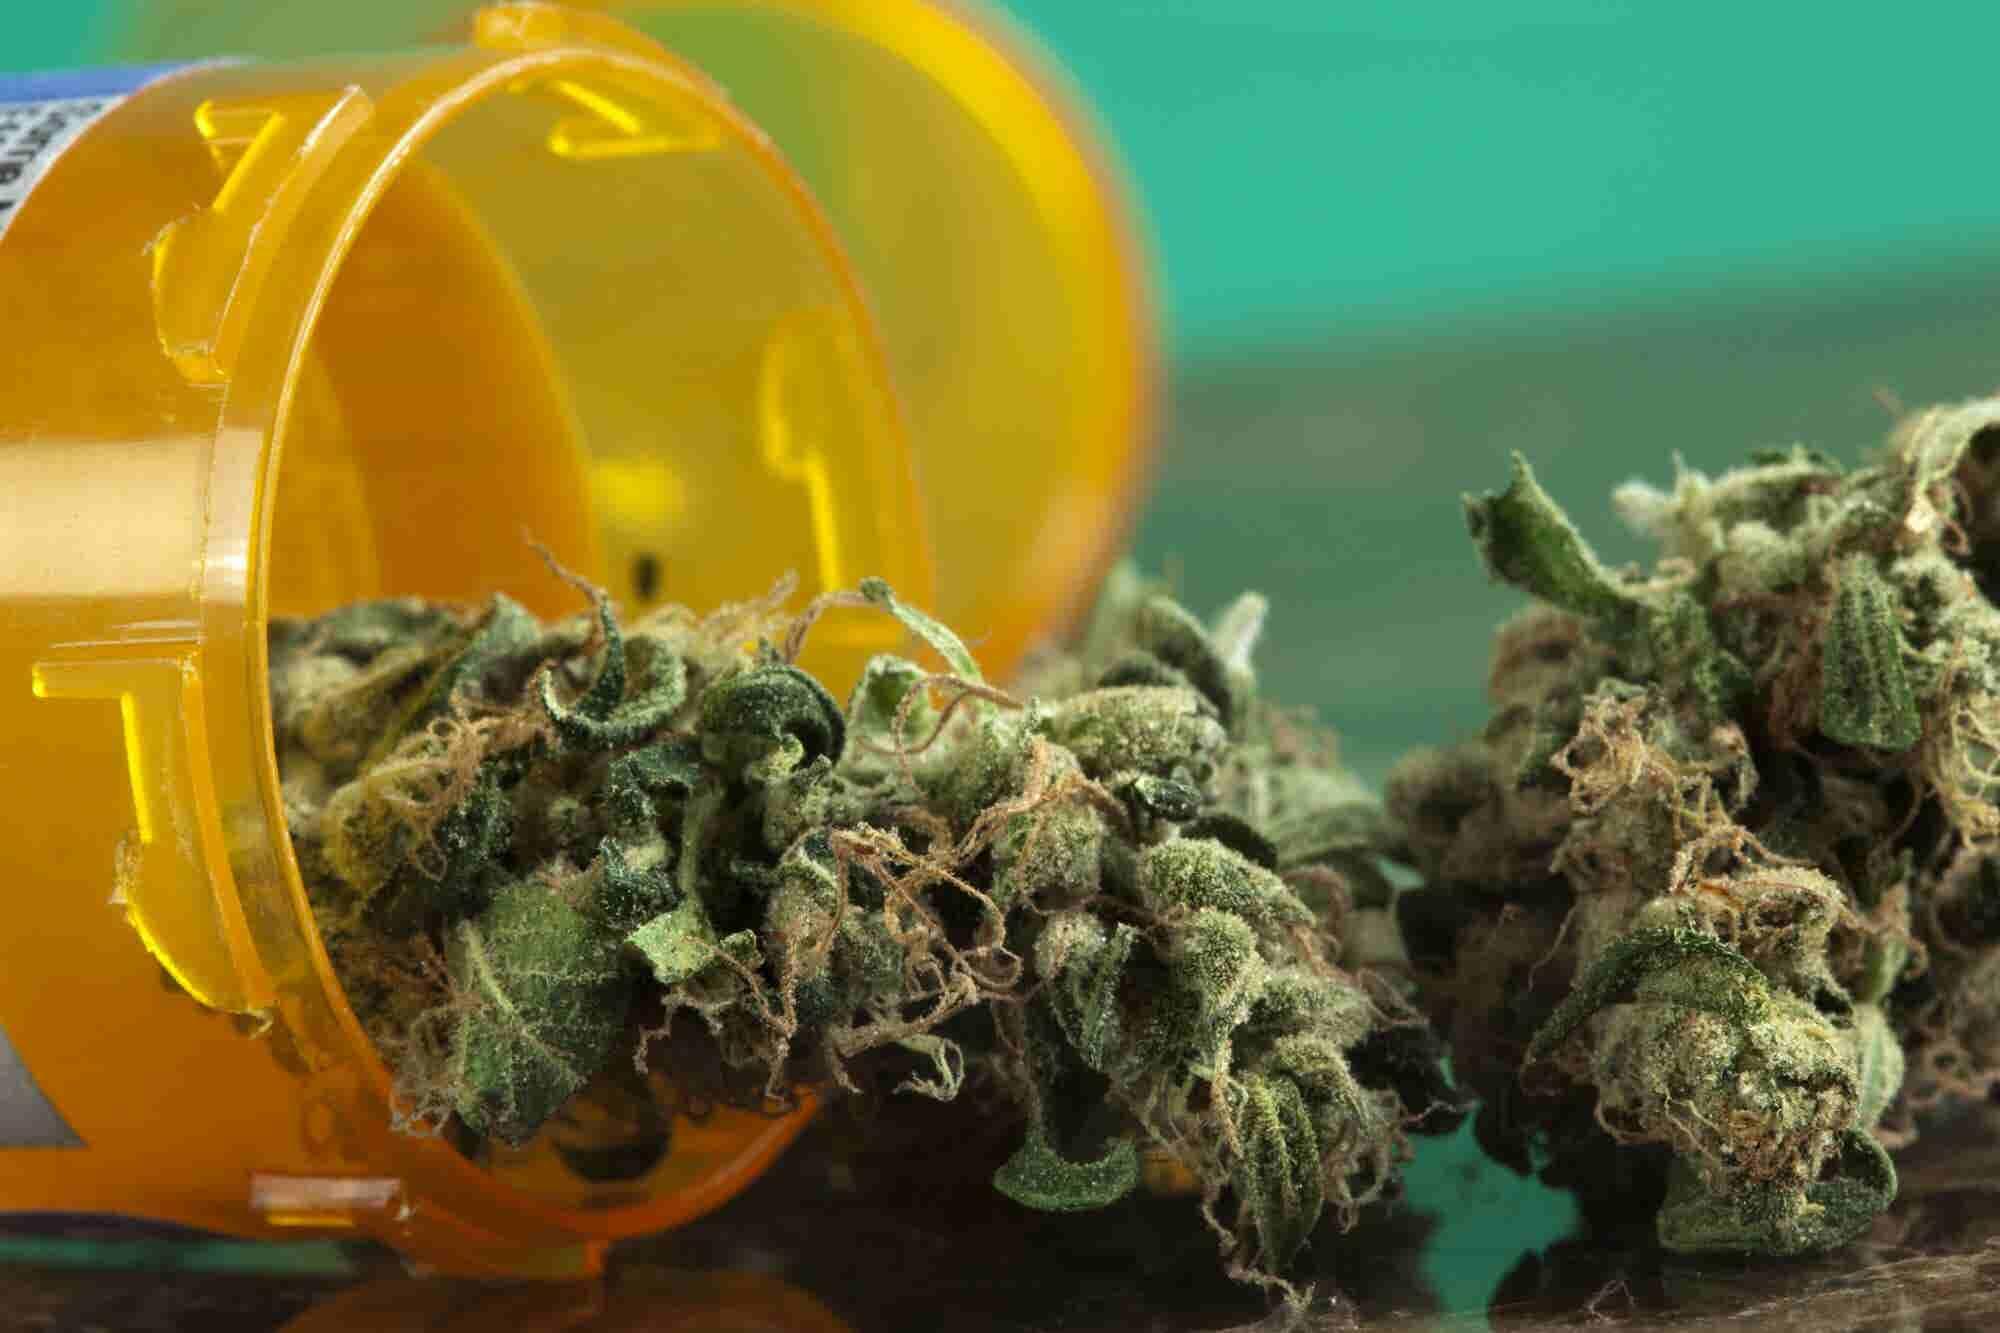 A Plea to Our Elders: Consider Medical Marijuana Before Opioids